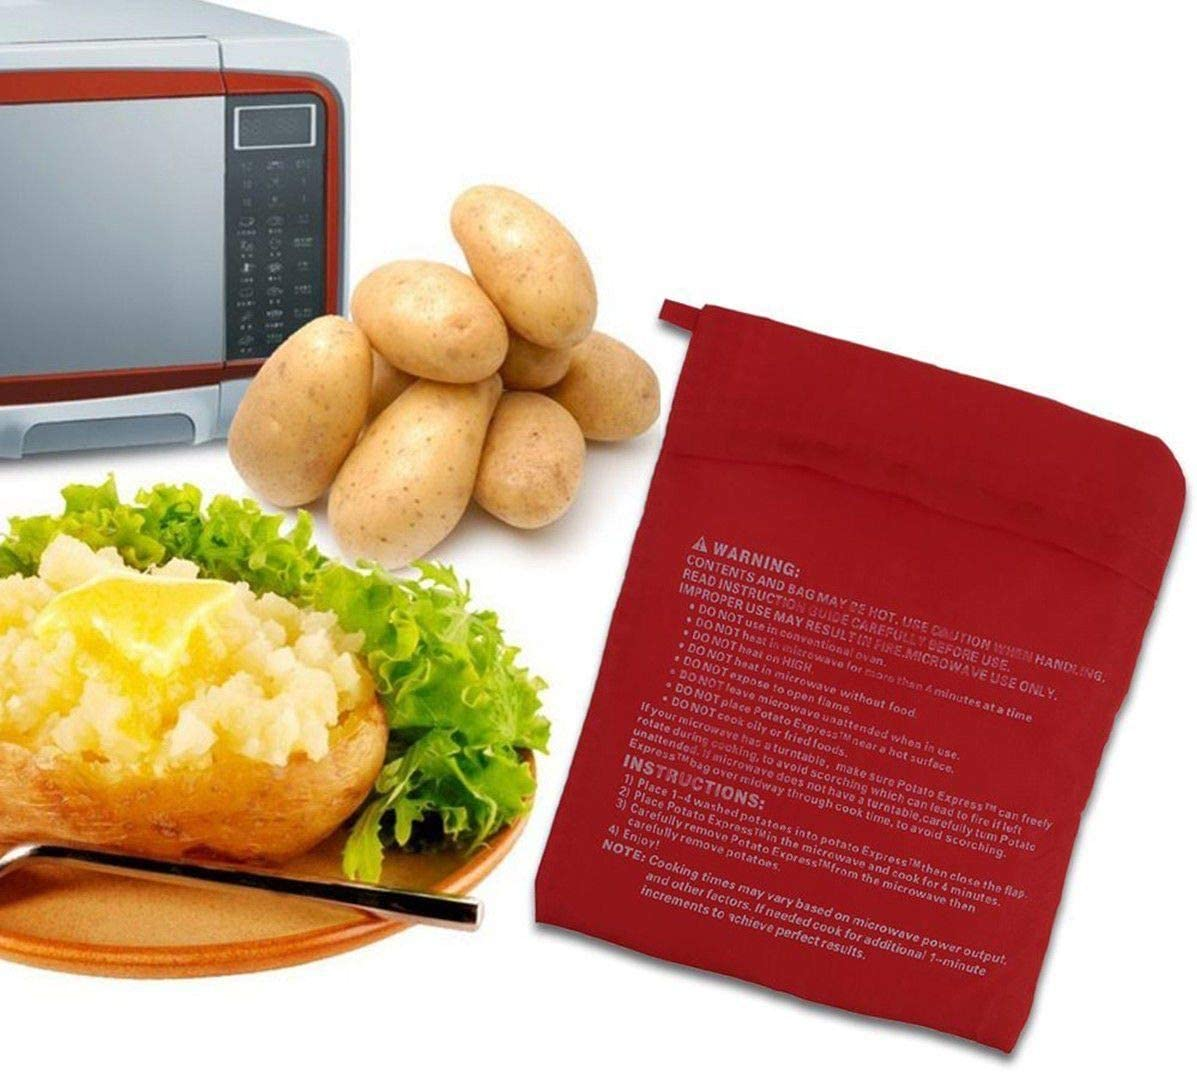 ACELEY Bolsa para cocinar Patatas para microondas, Bolsa para cocinar Tortillas Lavables, Bolsa para Patatas Reutilizable, Bolsas para Patatas para microondas, Bolsa para Patatas Cook tatoes